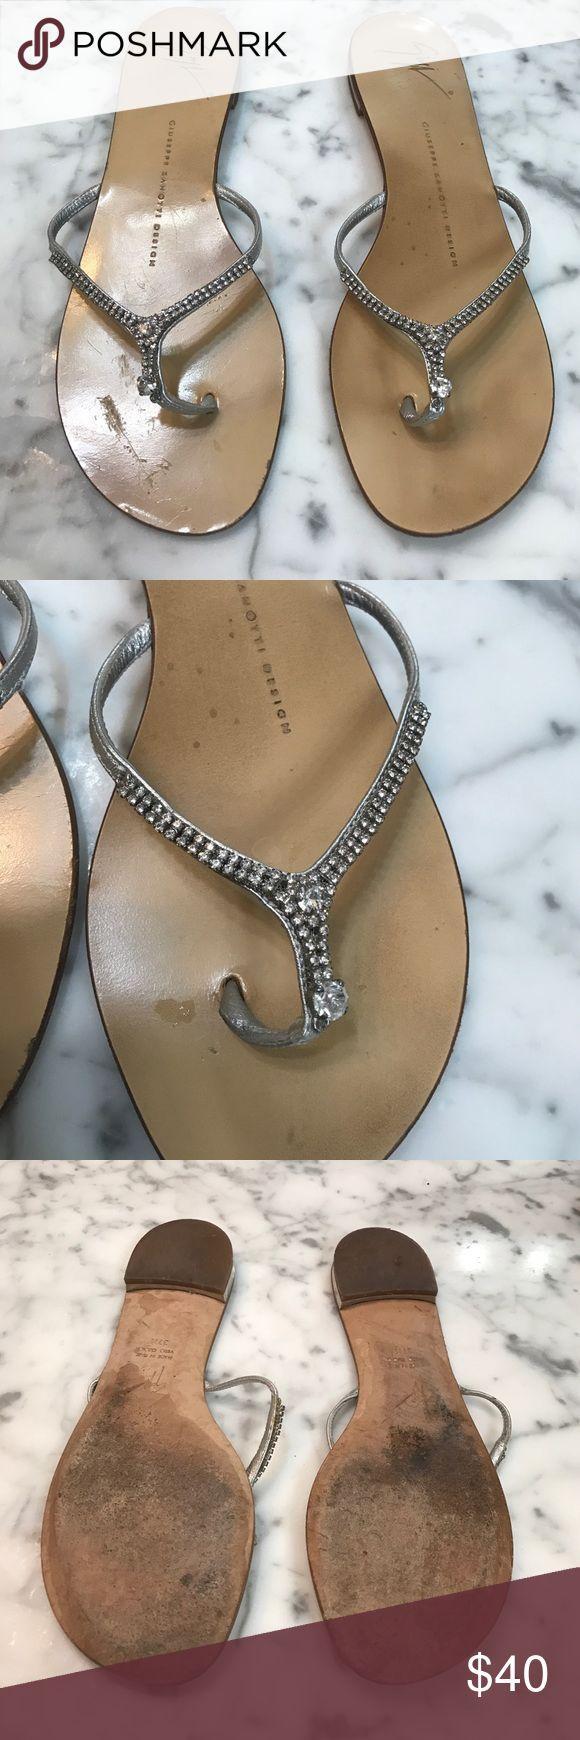 Giuseppe Zanotti  Sandals Size 37 1/2 (7.5 US) Giuseppe Zanotti Design sandles. Straps are silver metallic with crystal stones. Giuseppe Zanotti Shoes Sandals